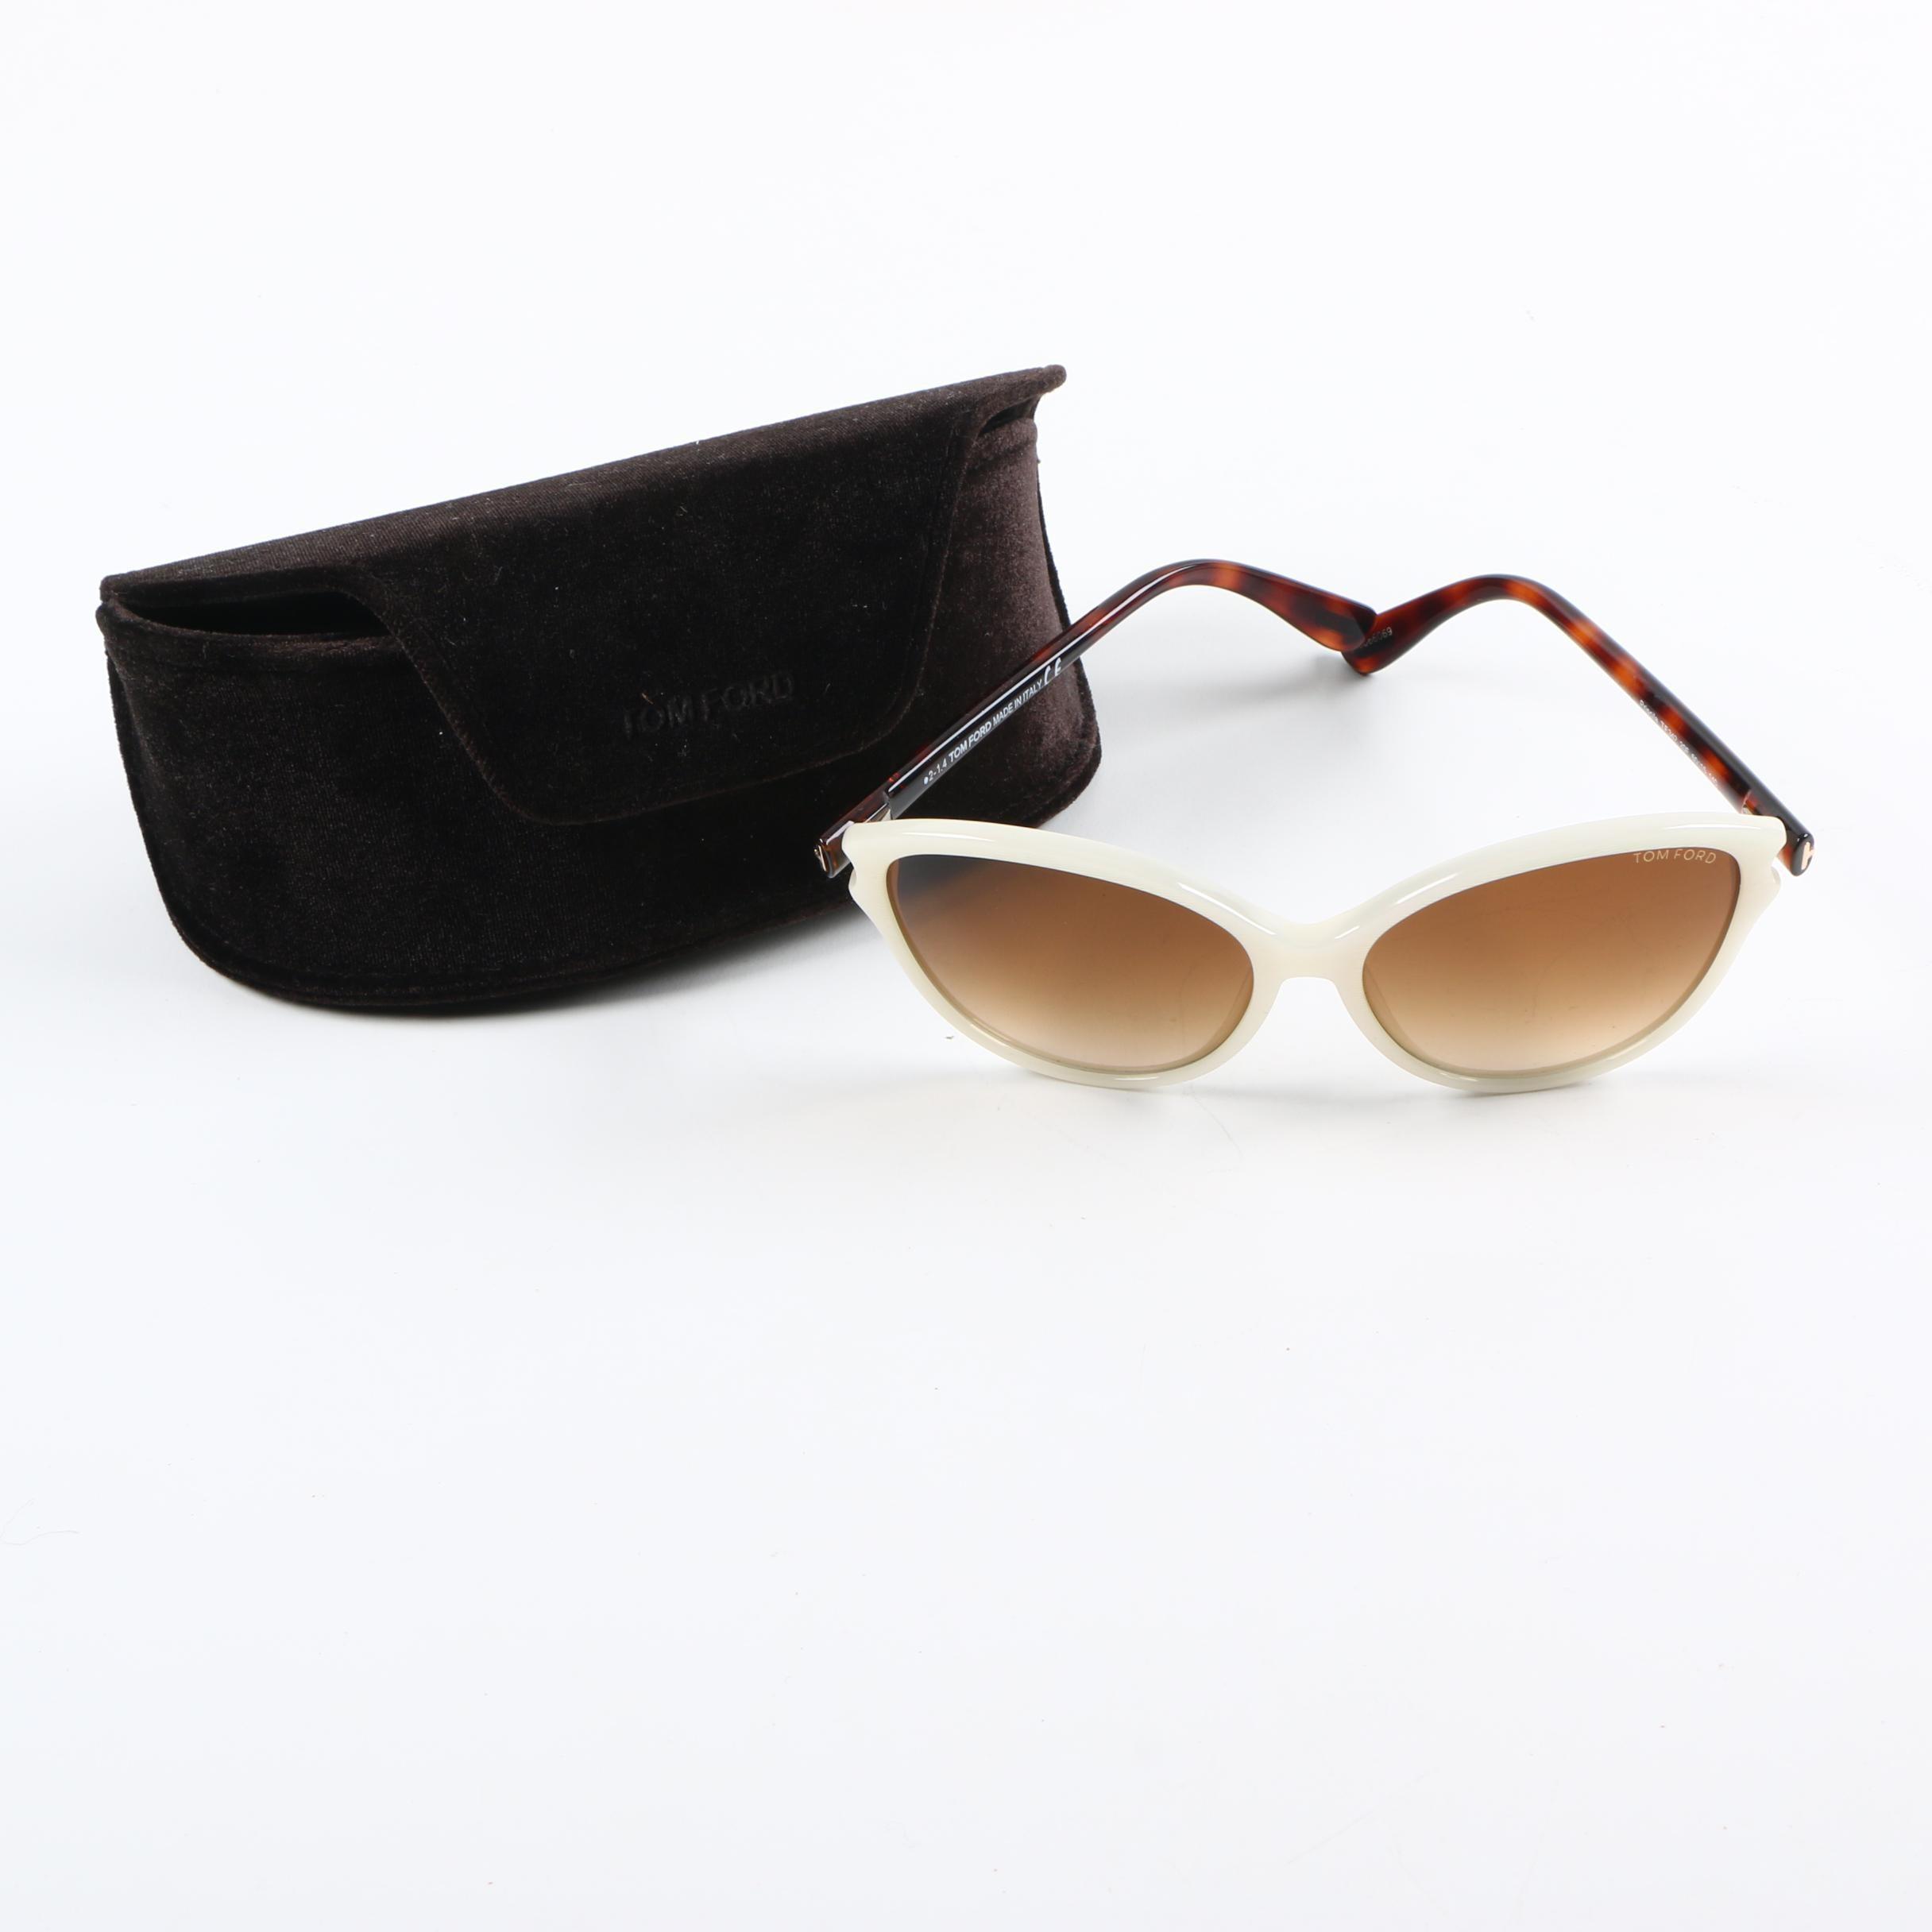 Tom Ford Priscila White Iridescent Cat Eye Sunglasses